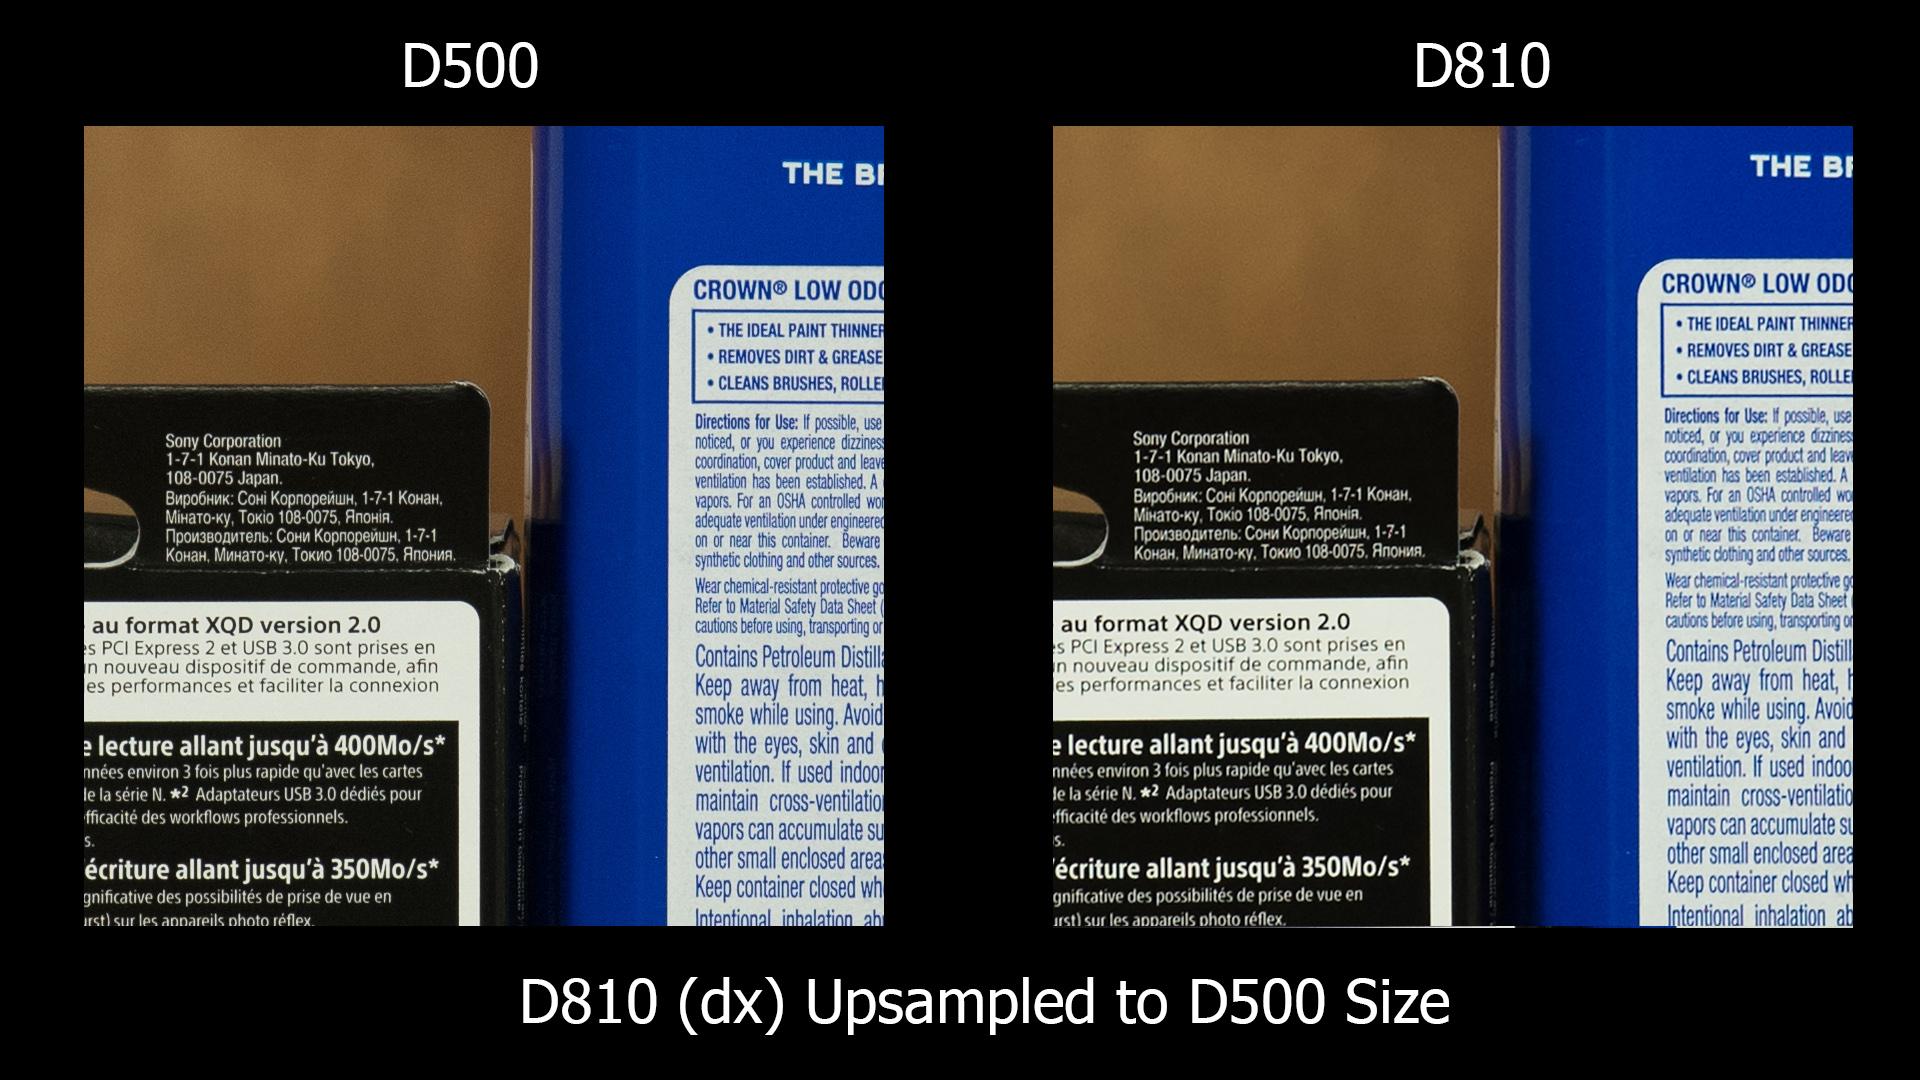 D500 vs D810 - D810 DX upsize